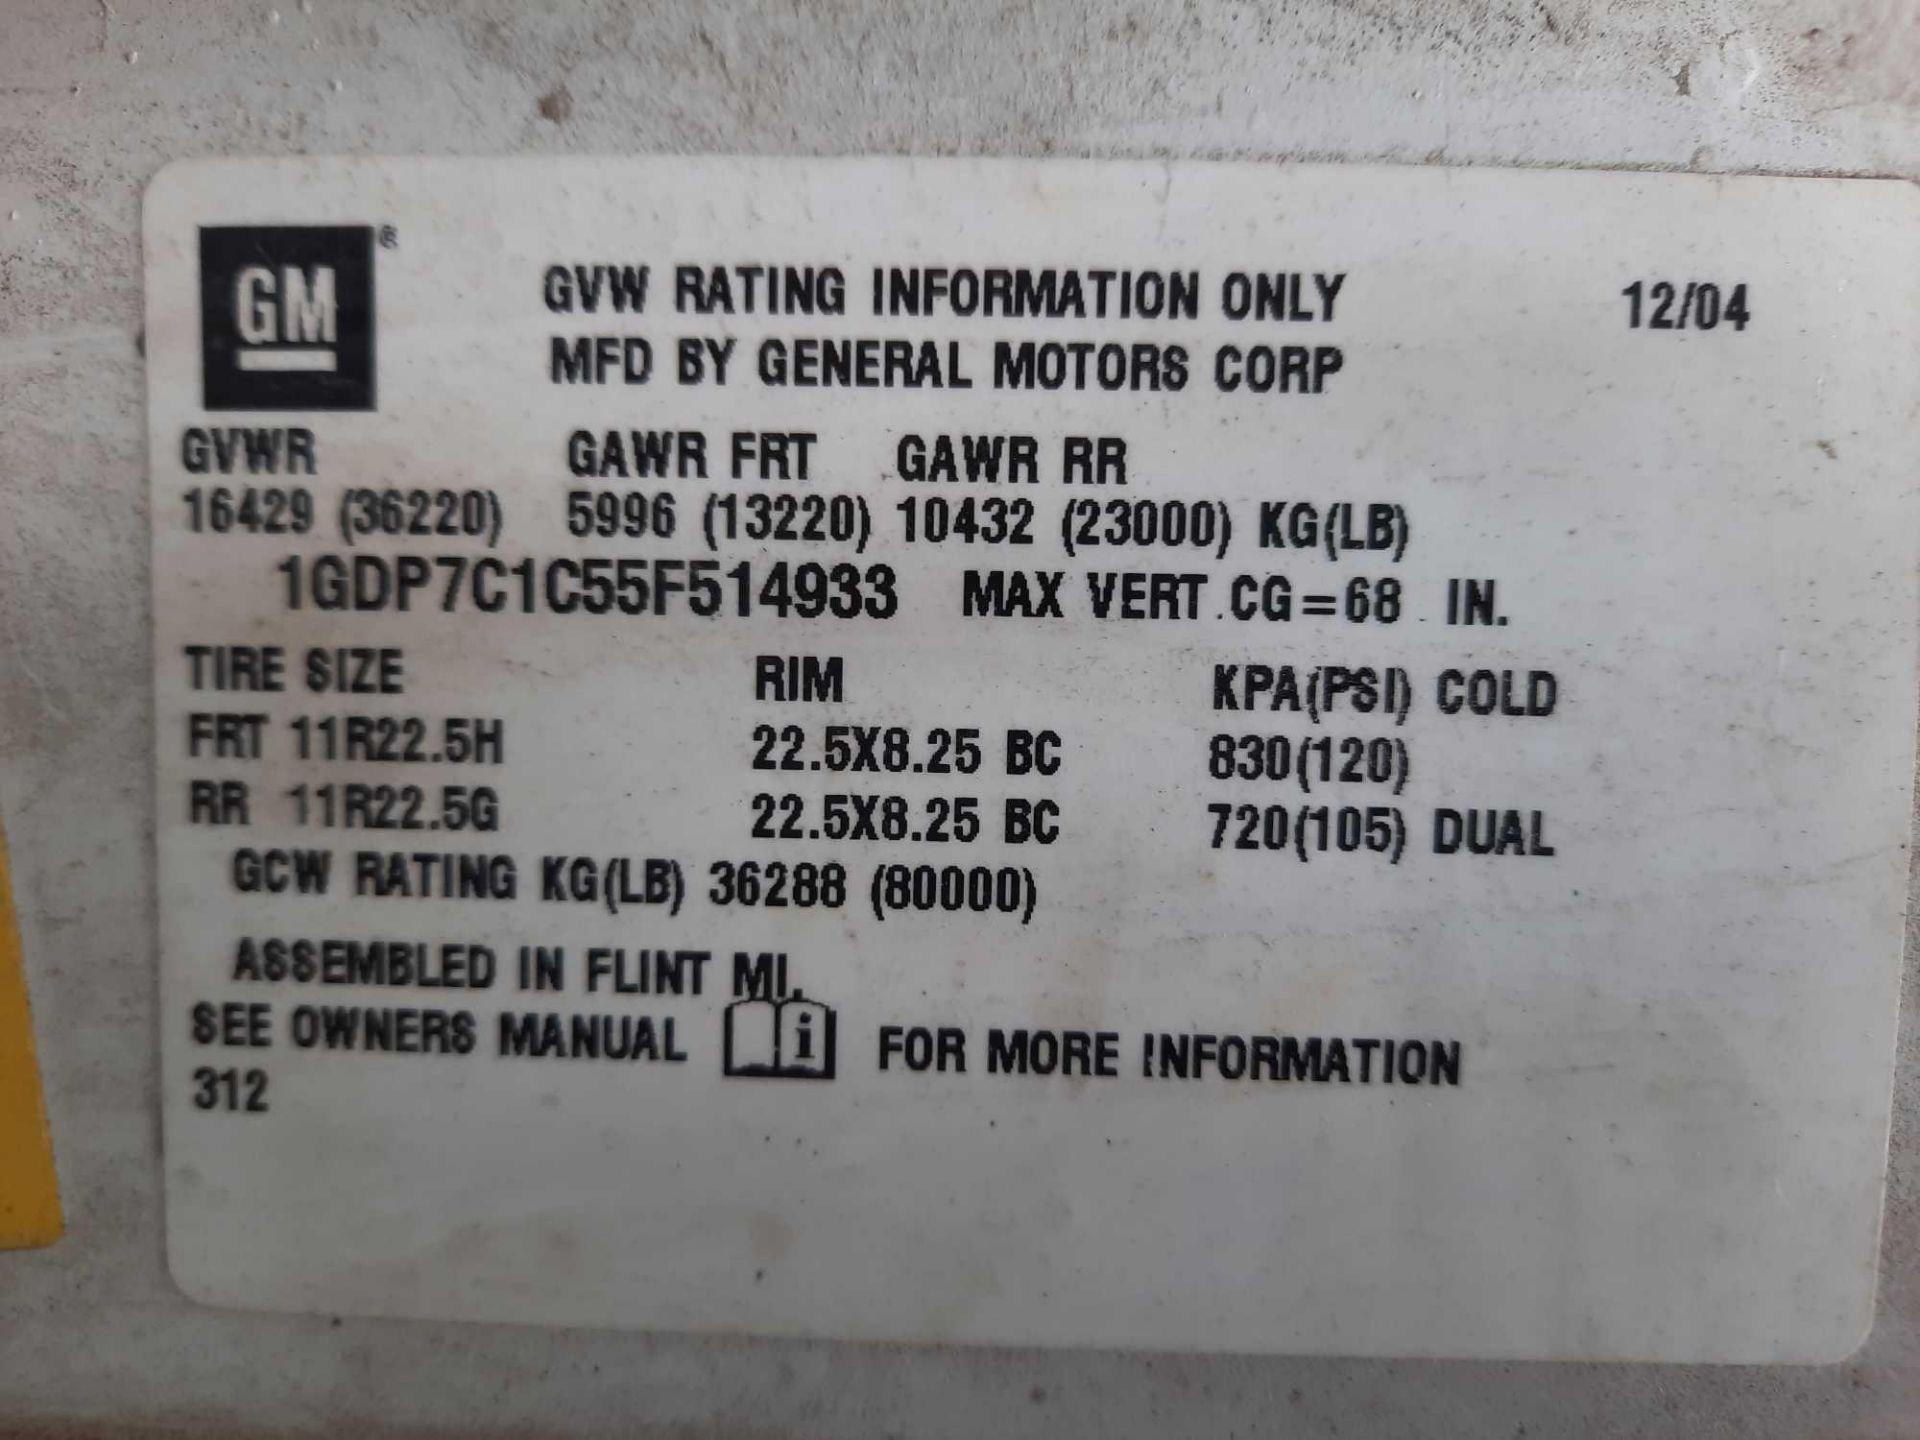 2005 GMC 7500 10' DUMP TRUCK (VDOT UNIT #: R07219) - Image 5 of 16